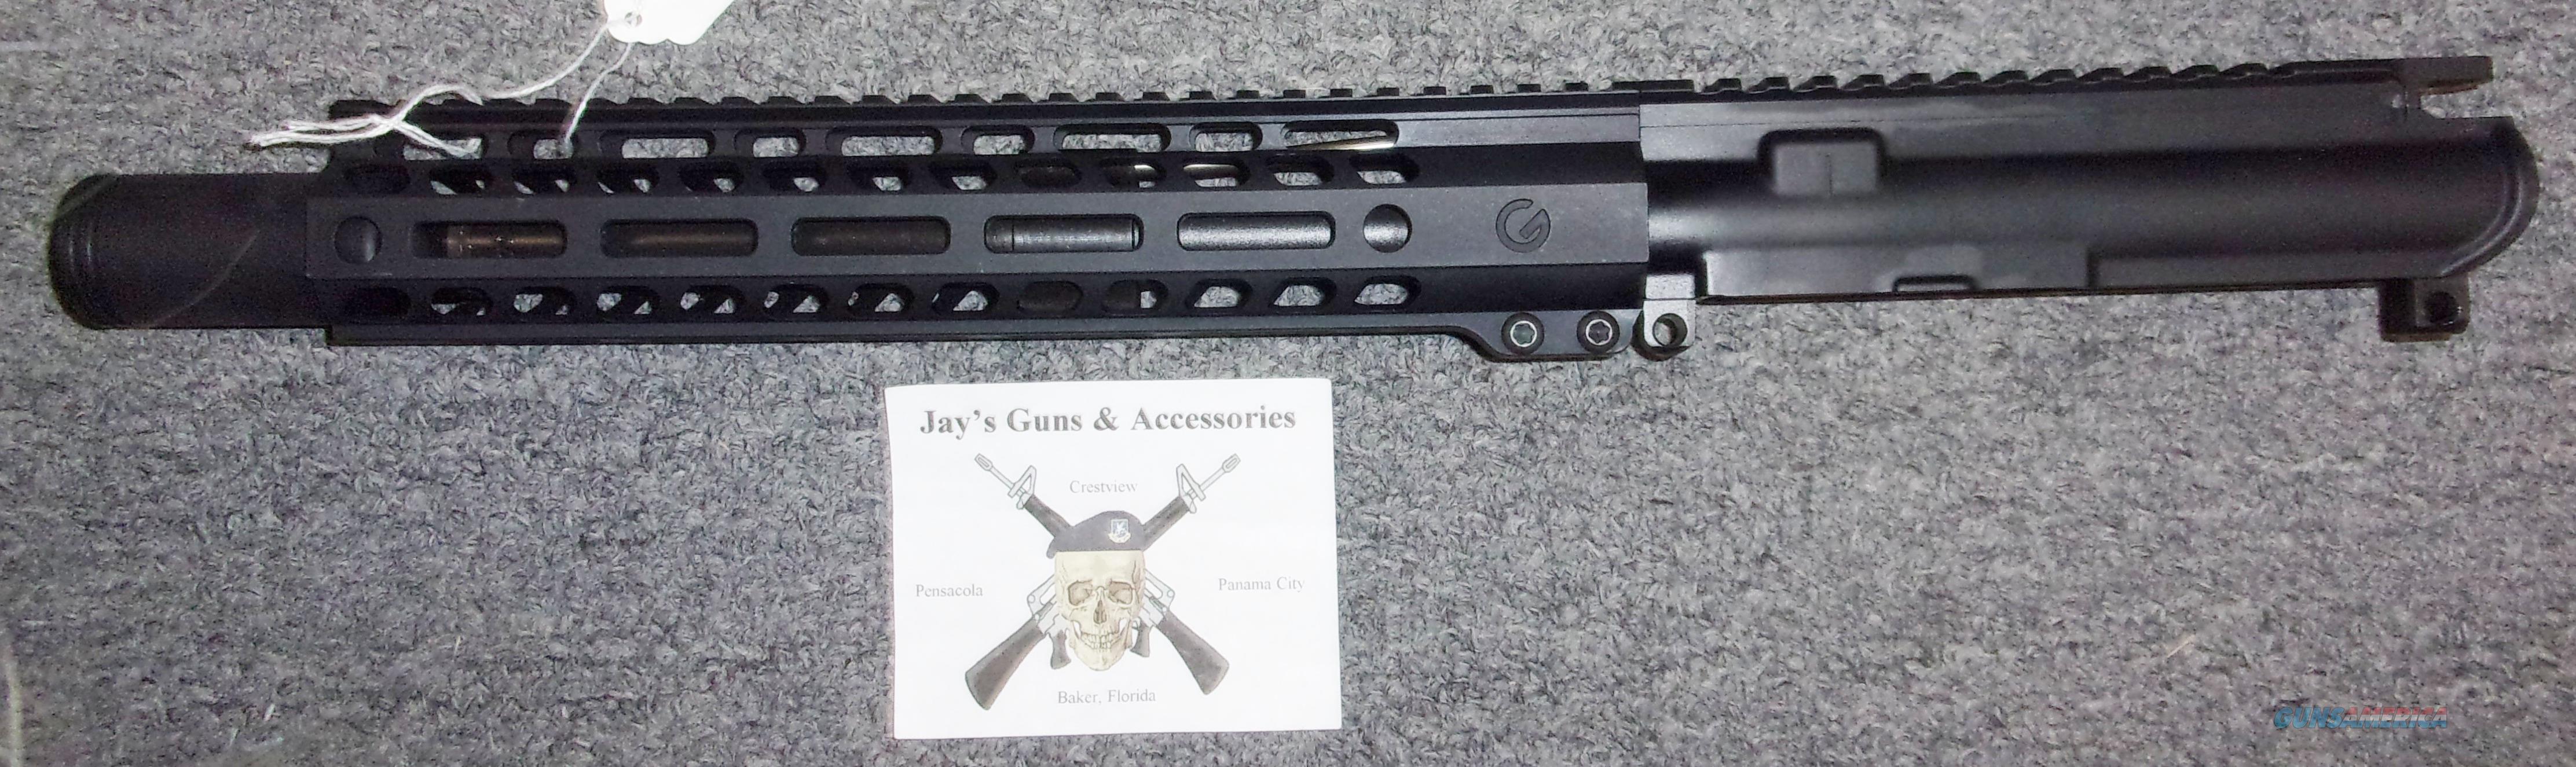 "10"" Upper Receiver in .300 blackout  Non-Guns > Gun Parts > M16-AR15 > Upper Only"